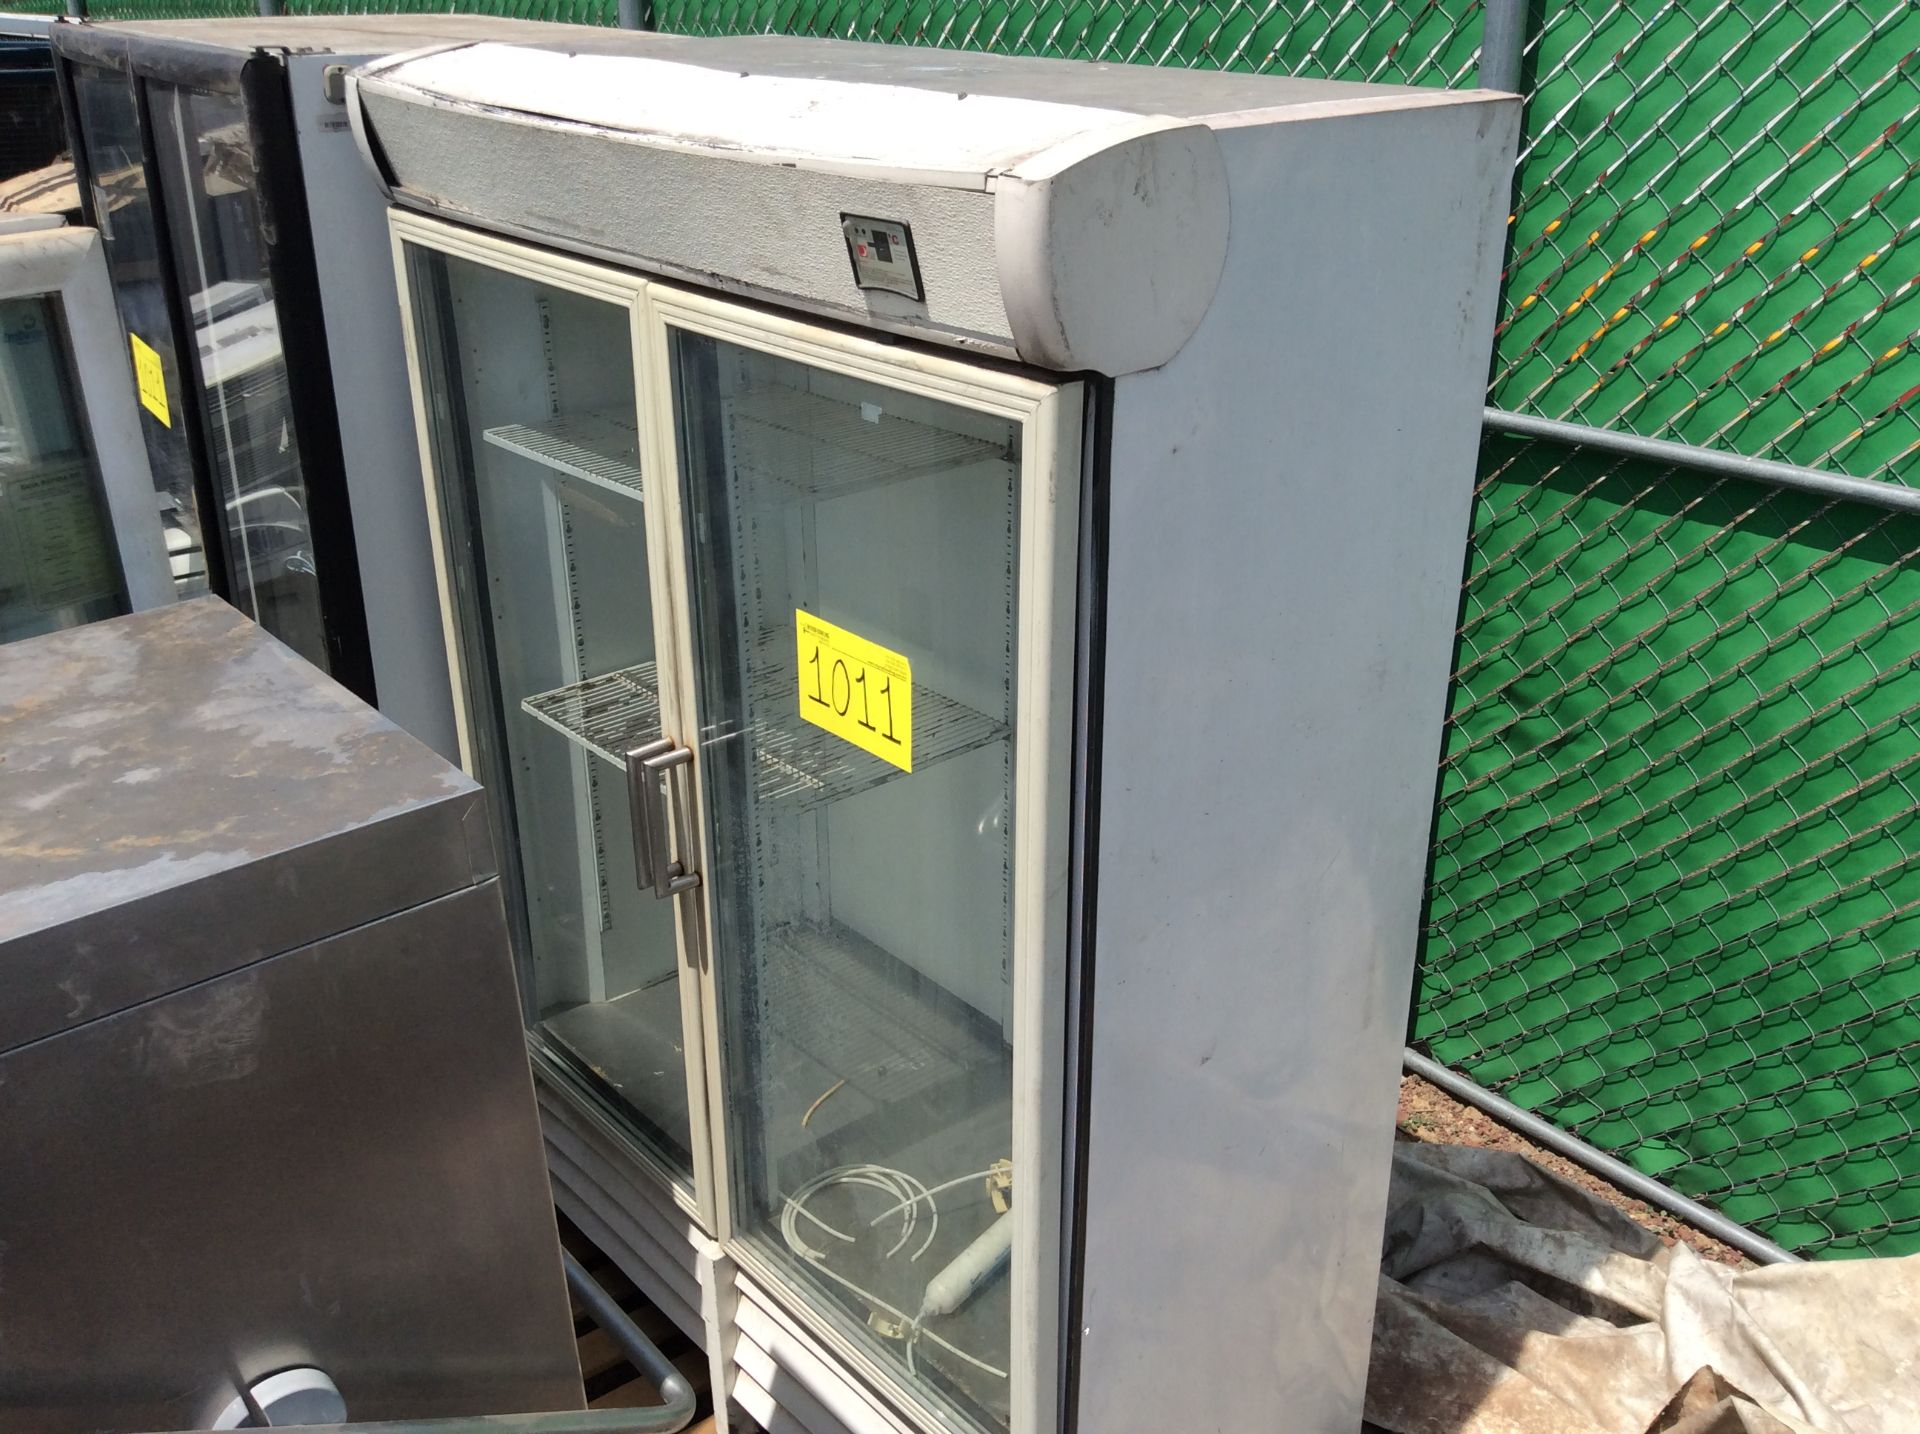 1 Ojeda refrigerator of double glass door model RV2P36 serial number 0636323-34305 120V - Image 8 of 14